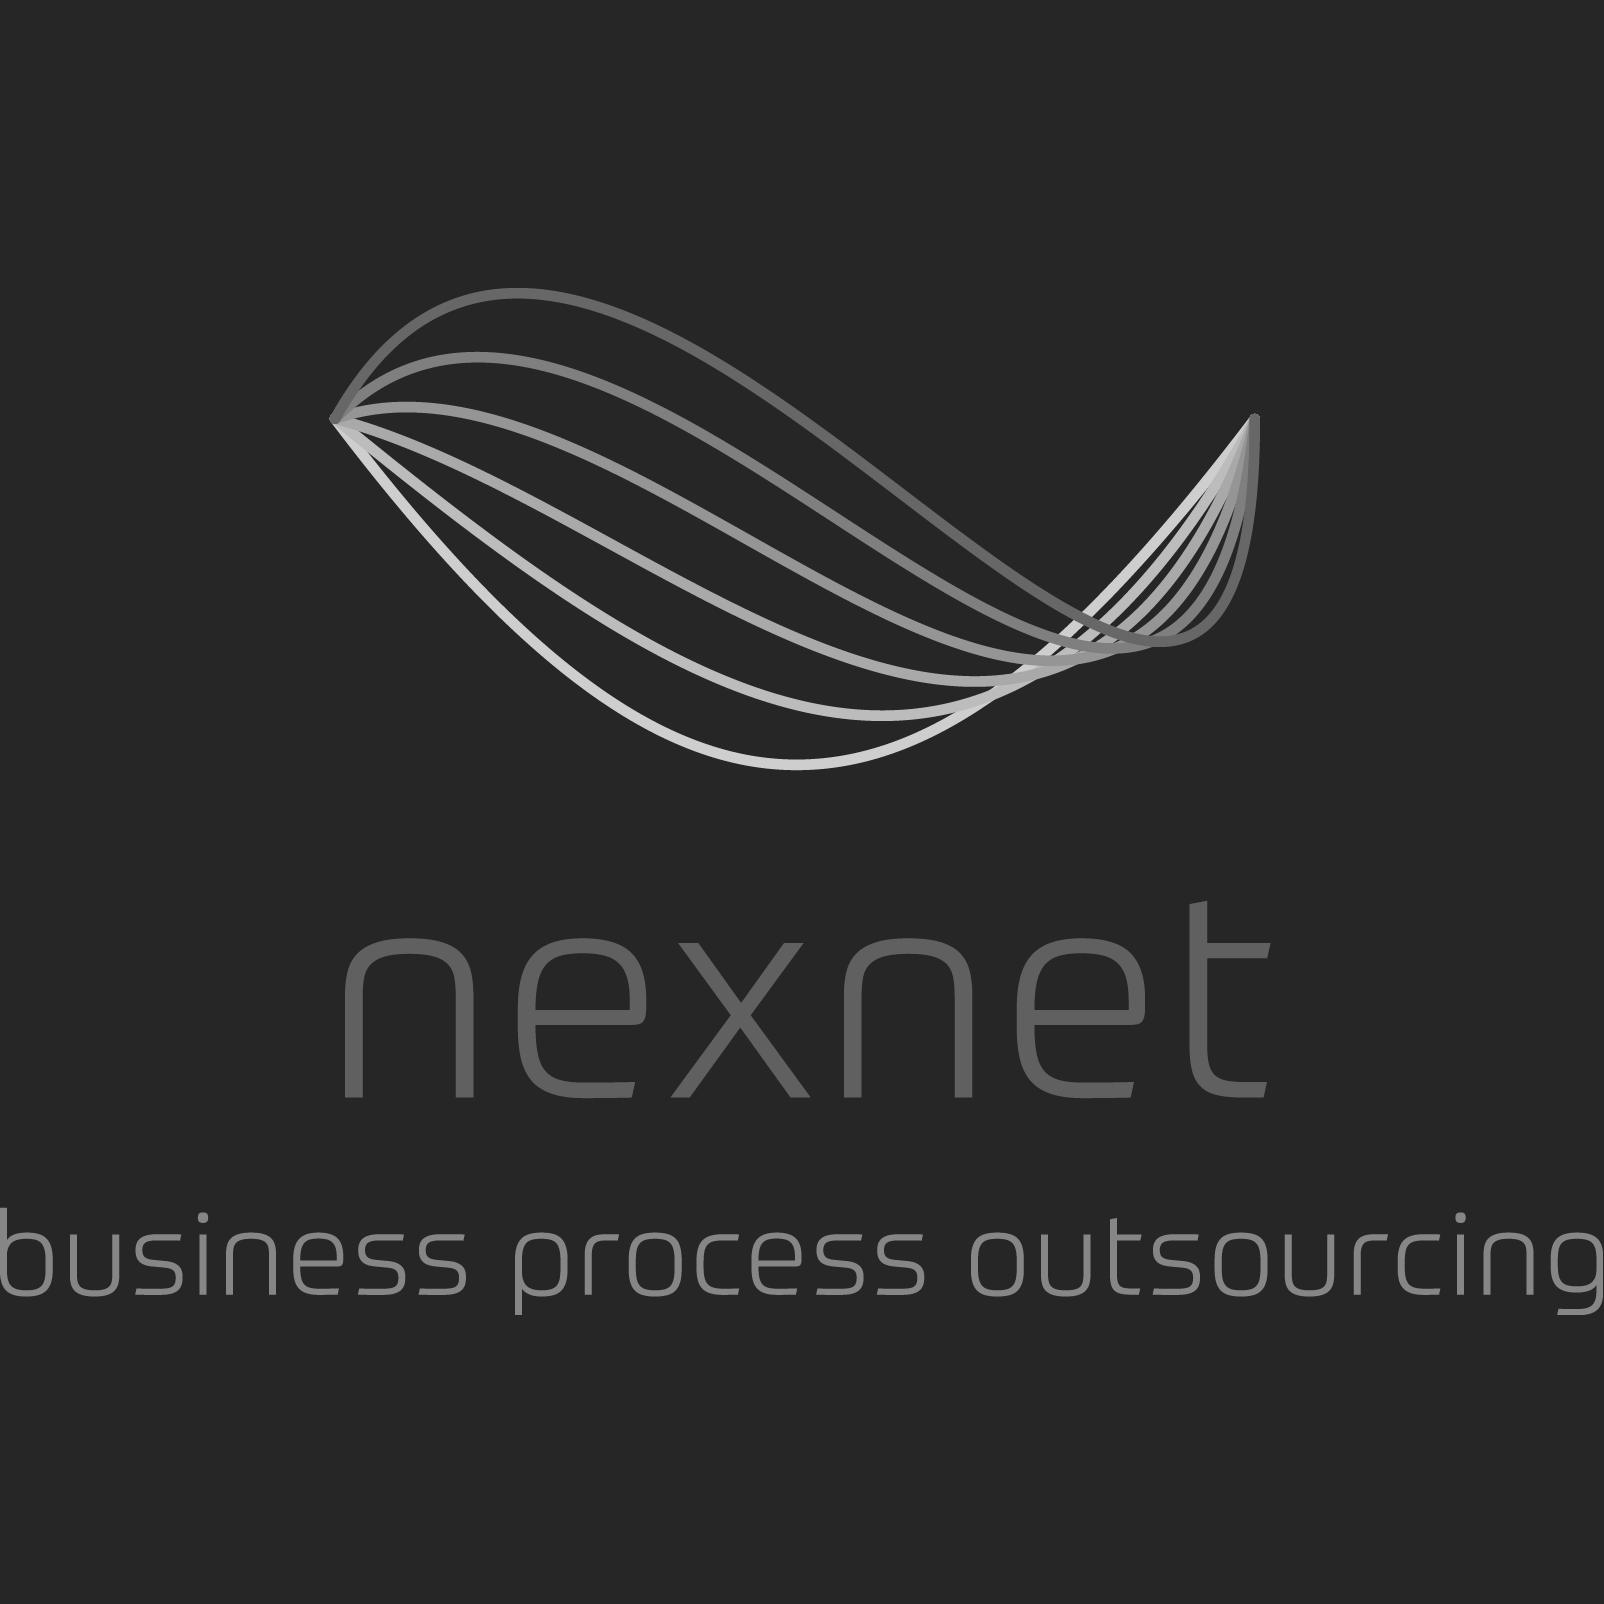 nexnet-logo-dunkel